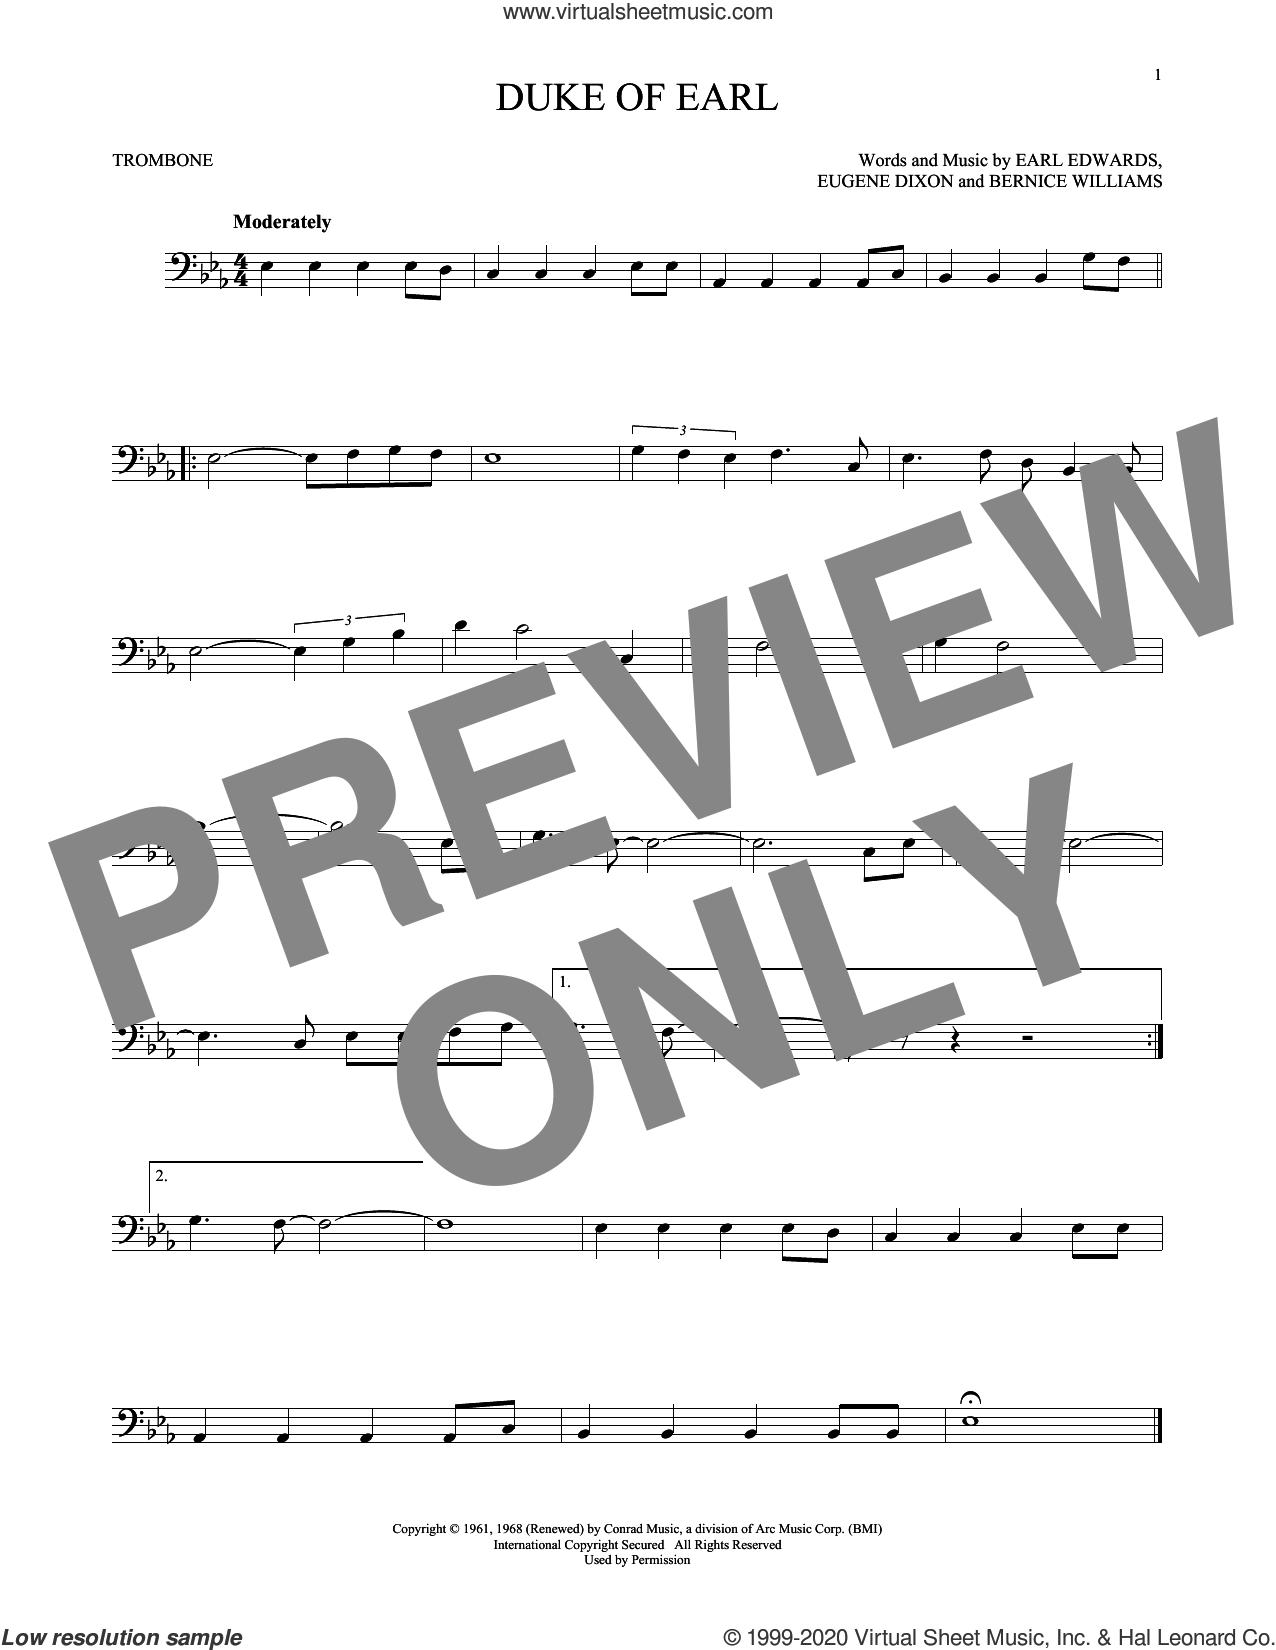 Duke Of Earl sheet music for trombone solo by Gene Chandler, Bernice Williams, Earl Edwards and Eugene Dixon, intermediate skill level